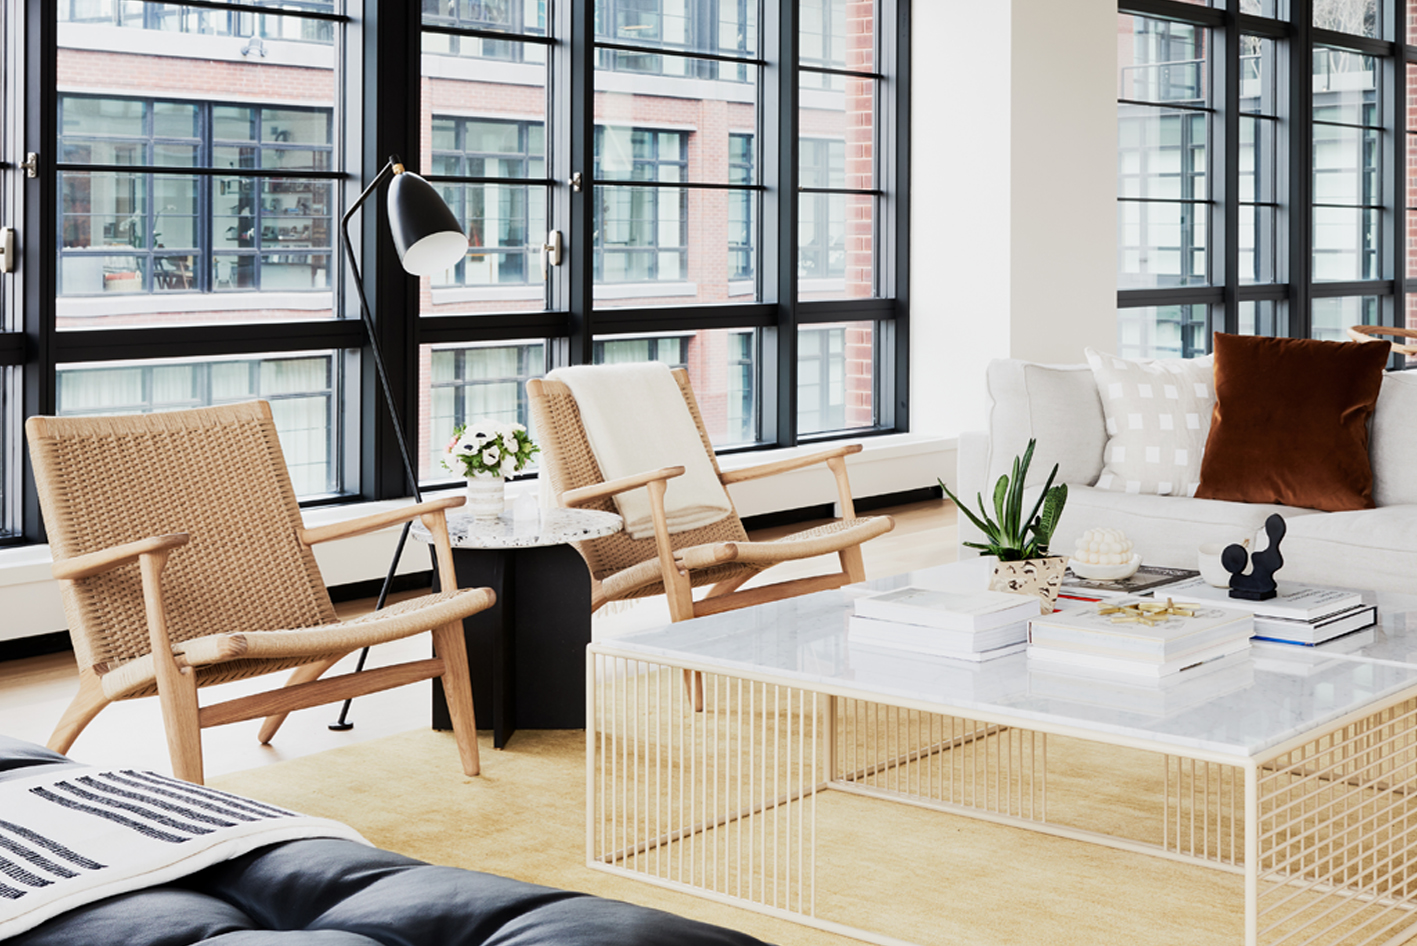 Charles St living chairs.jpg